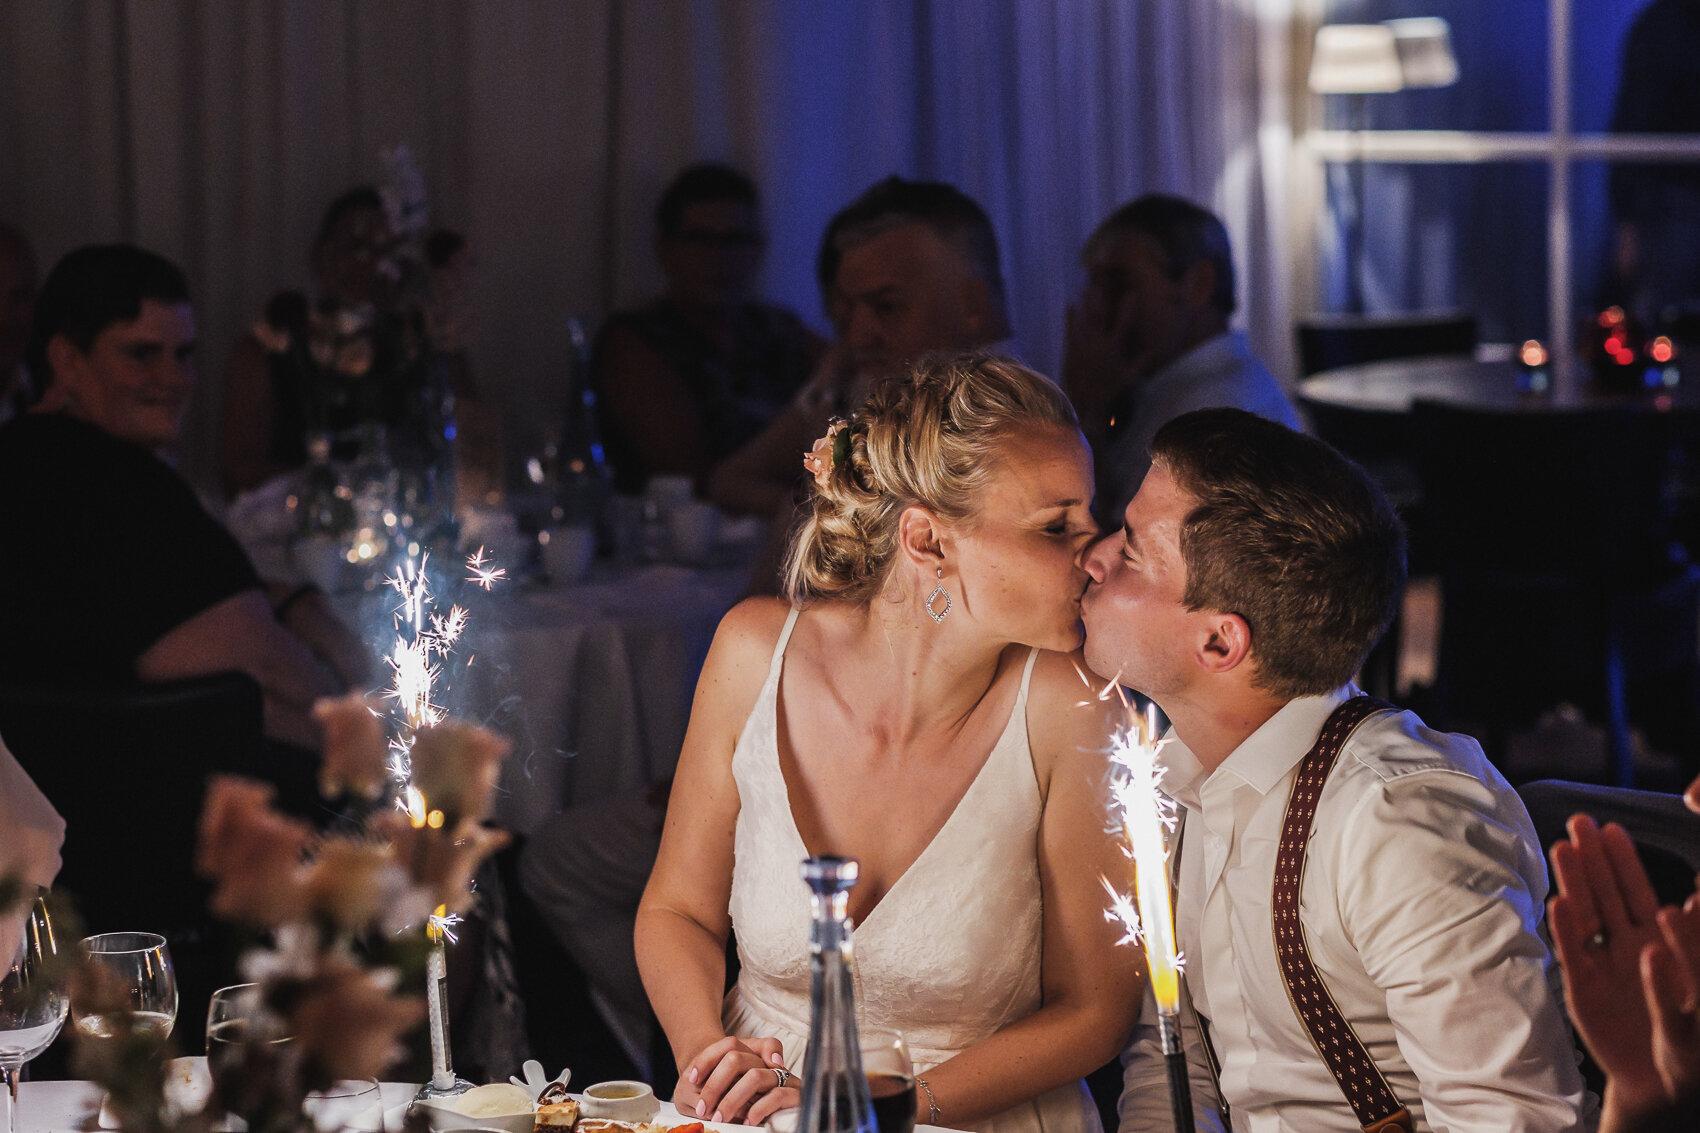 iso800 - huwelijksfotograaf isabo matthias verbeke foundation-34.jpg